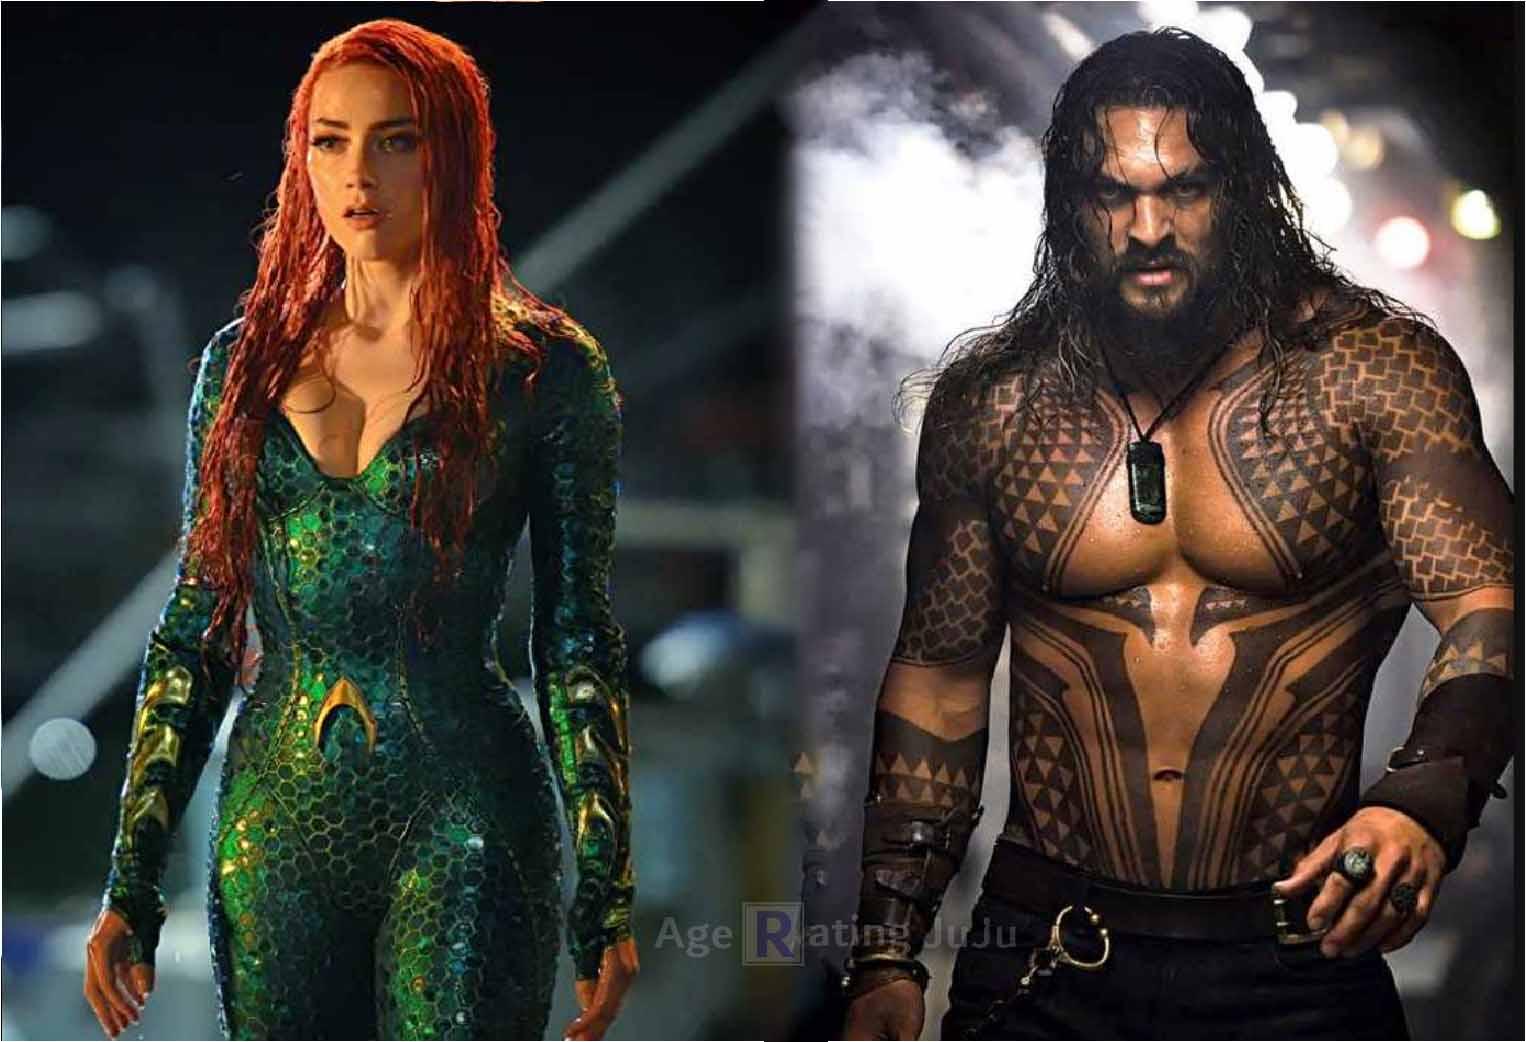 Movie Poster 2019: Aquaman Movie 2018 Age Restriction